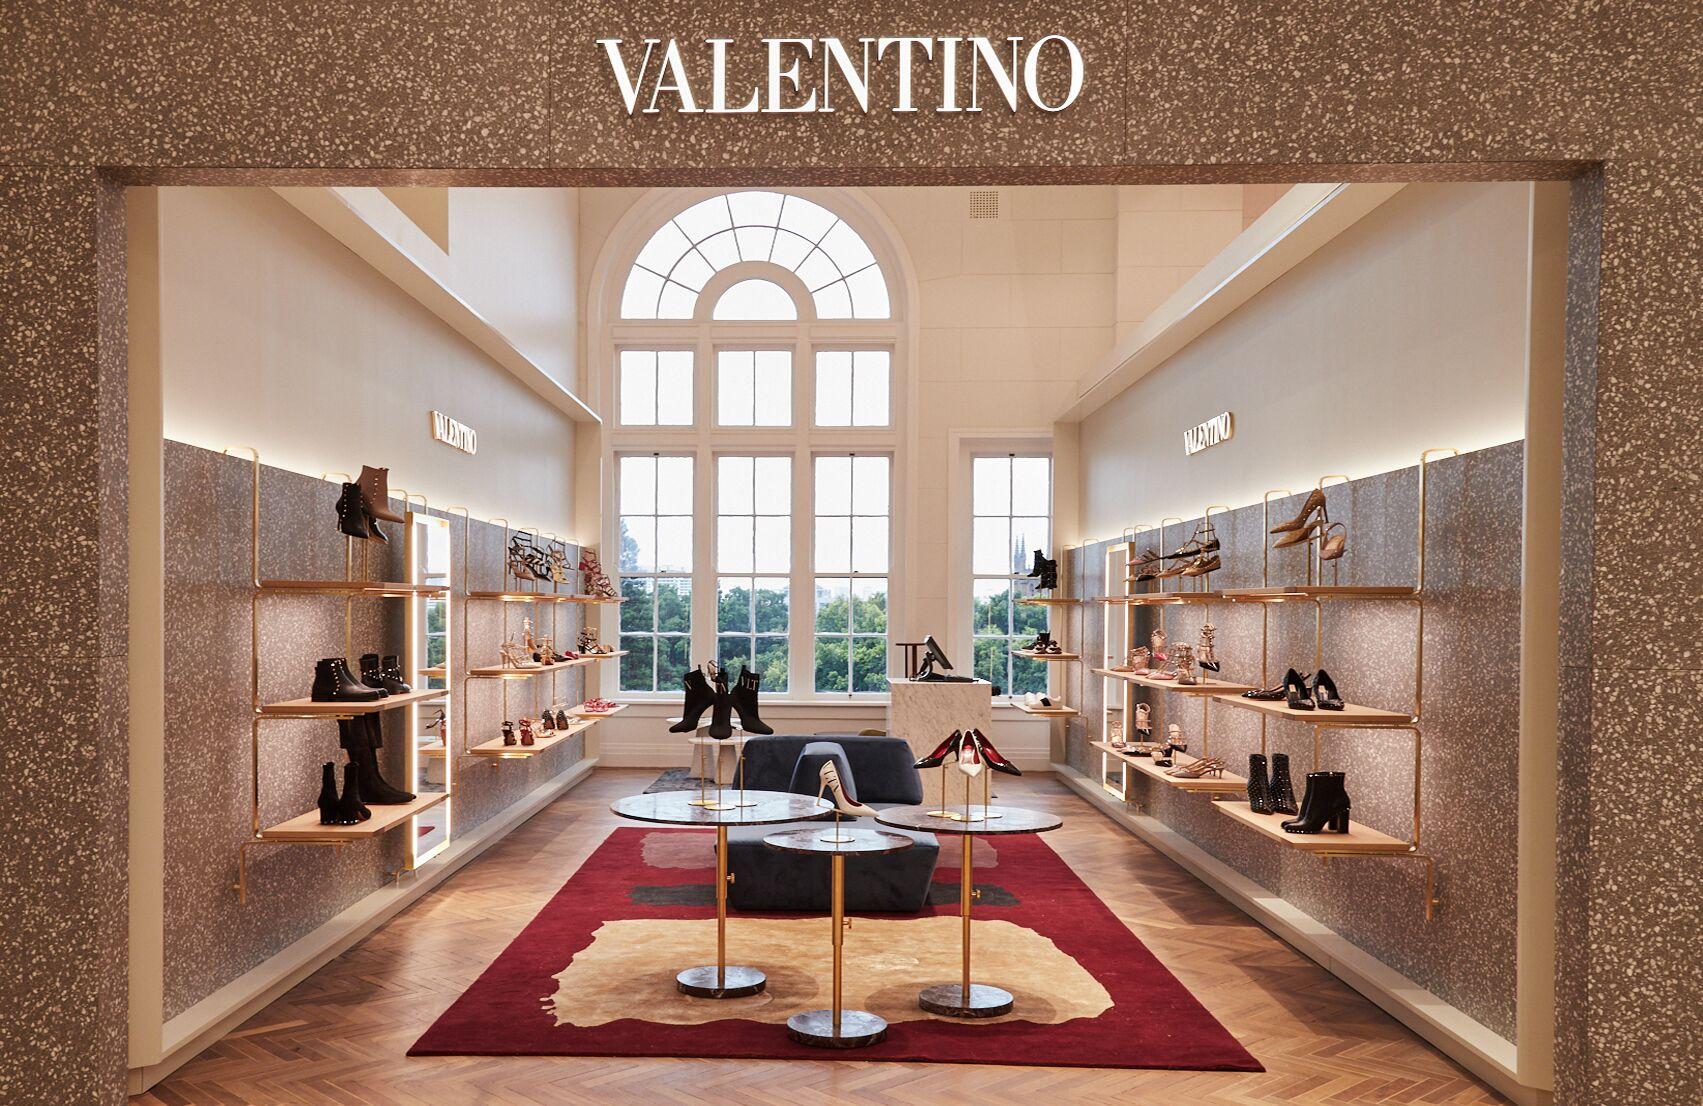 Valentino women's shoes boutique at David Jones, Sydney